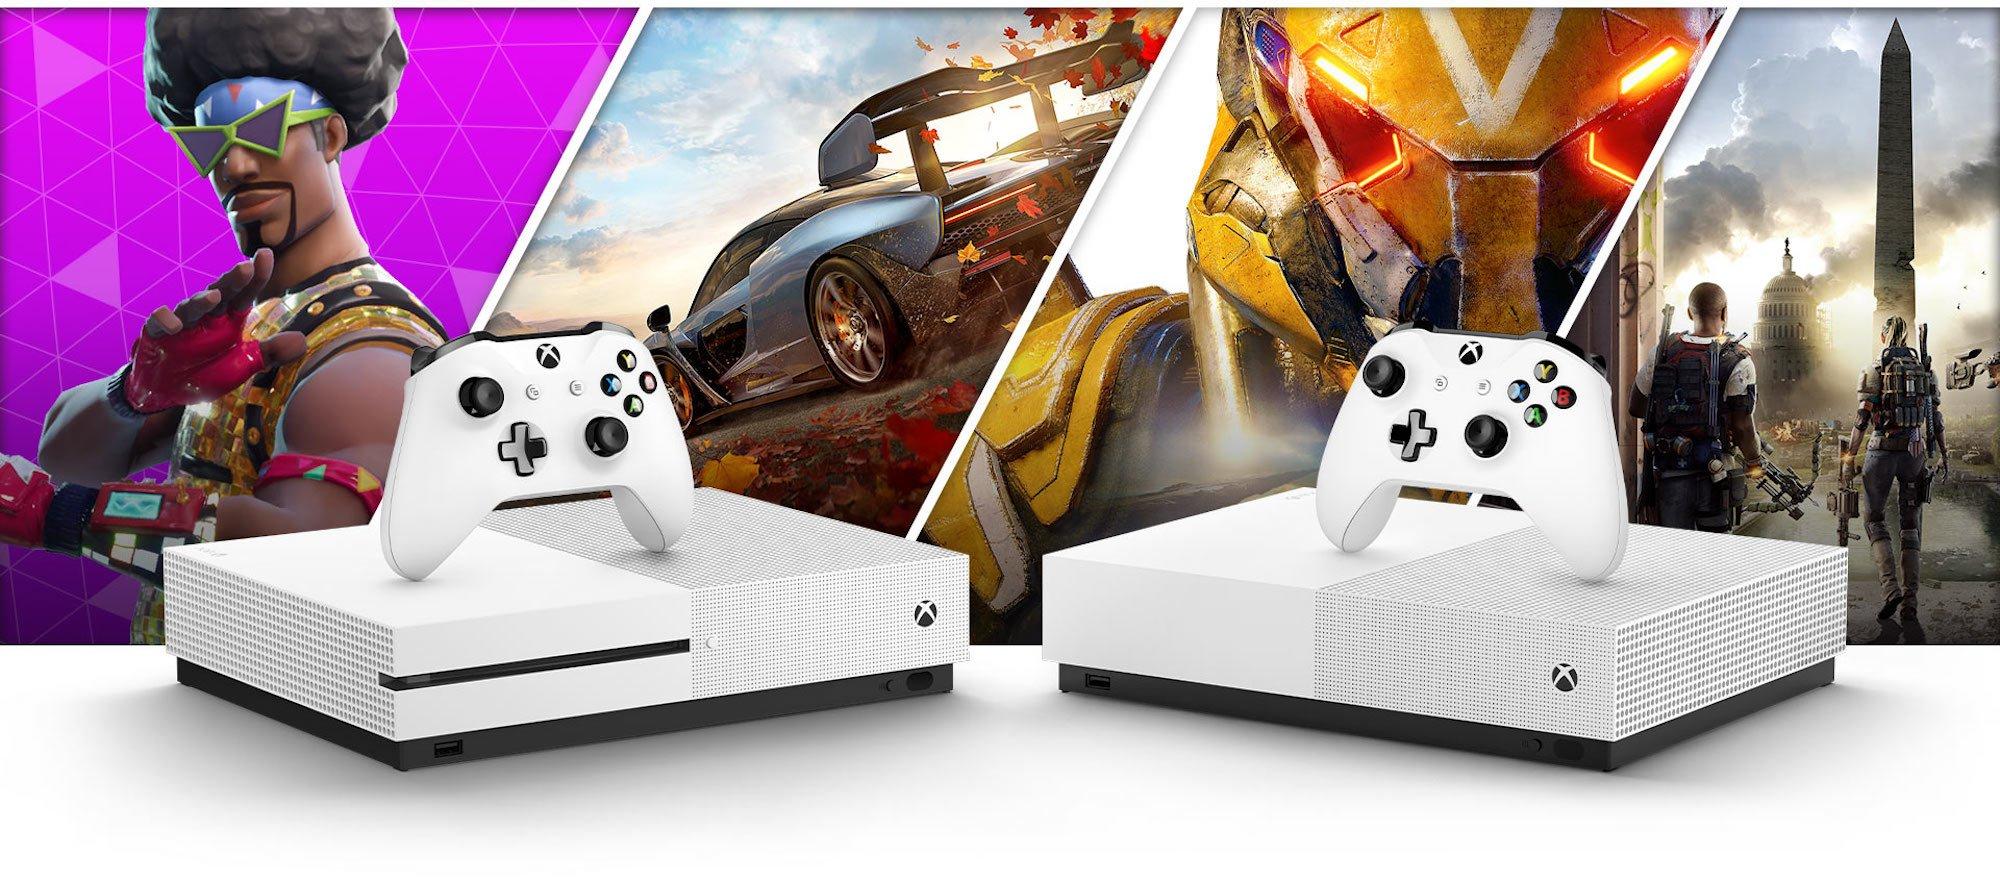 Xbox One S All-Digital